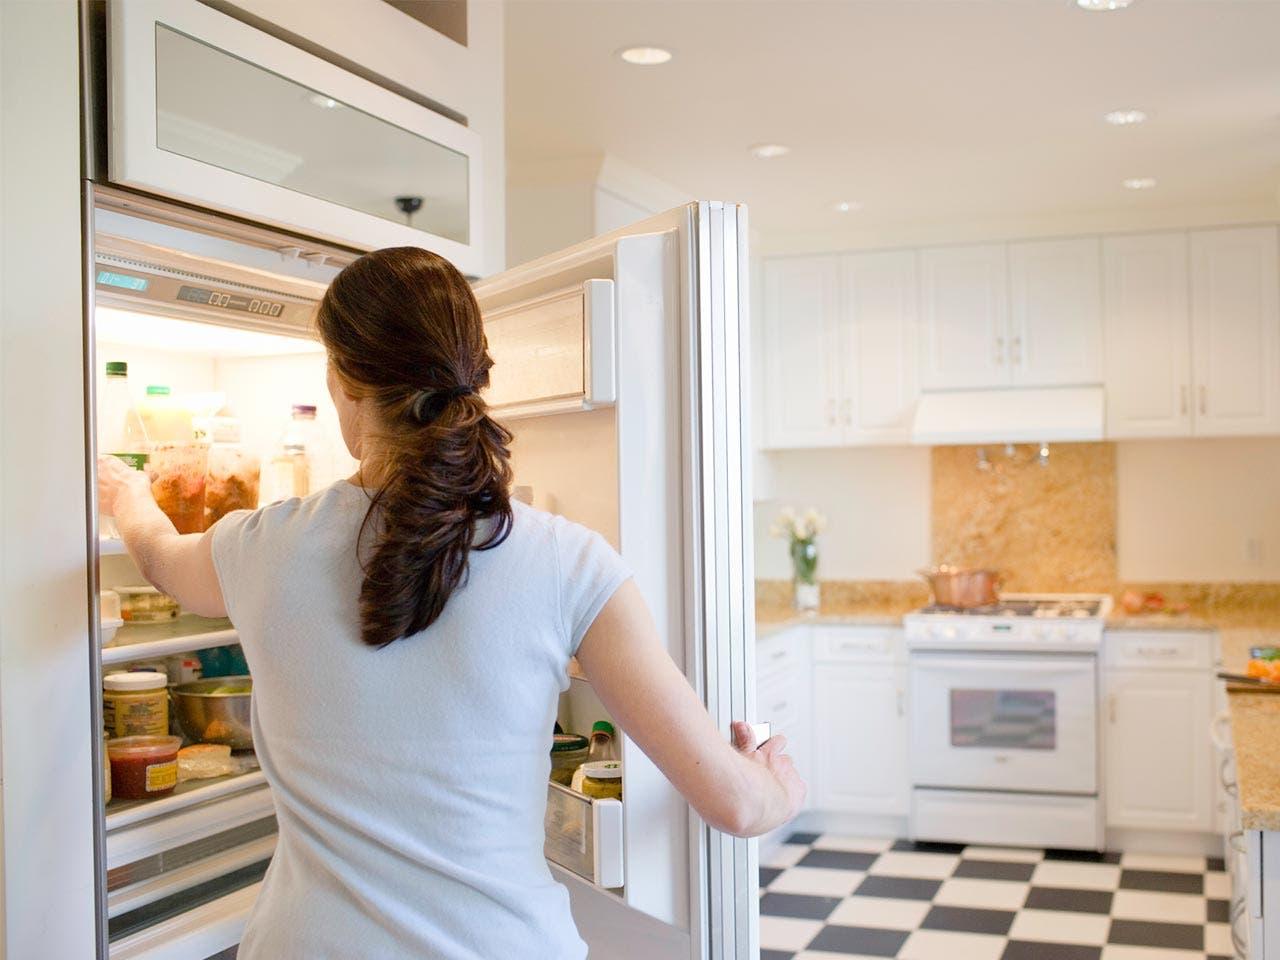 Woman reaching inside her refrigerator